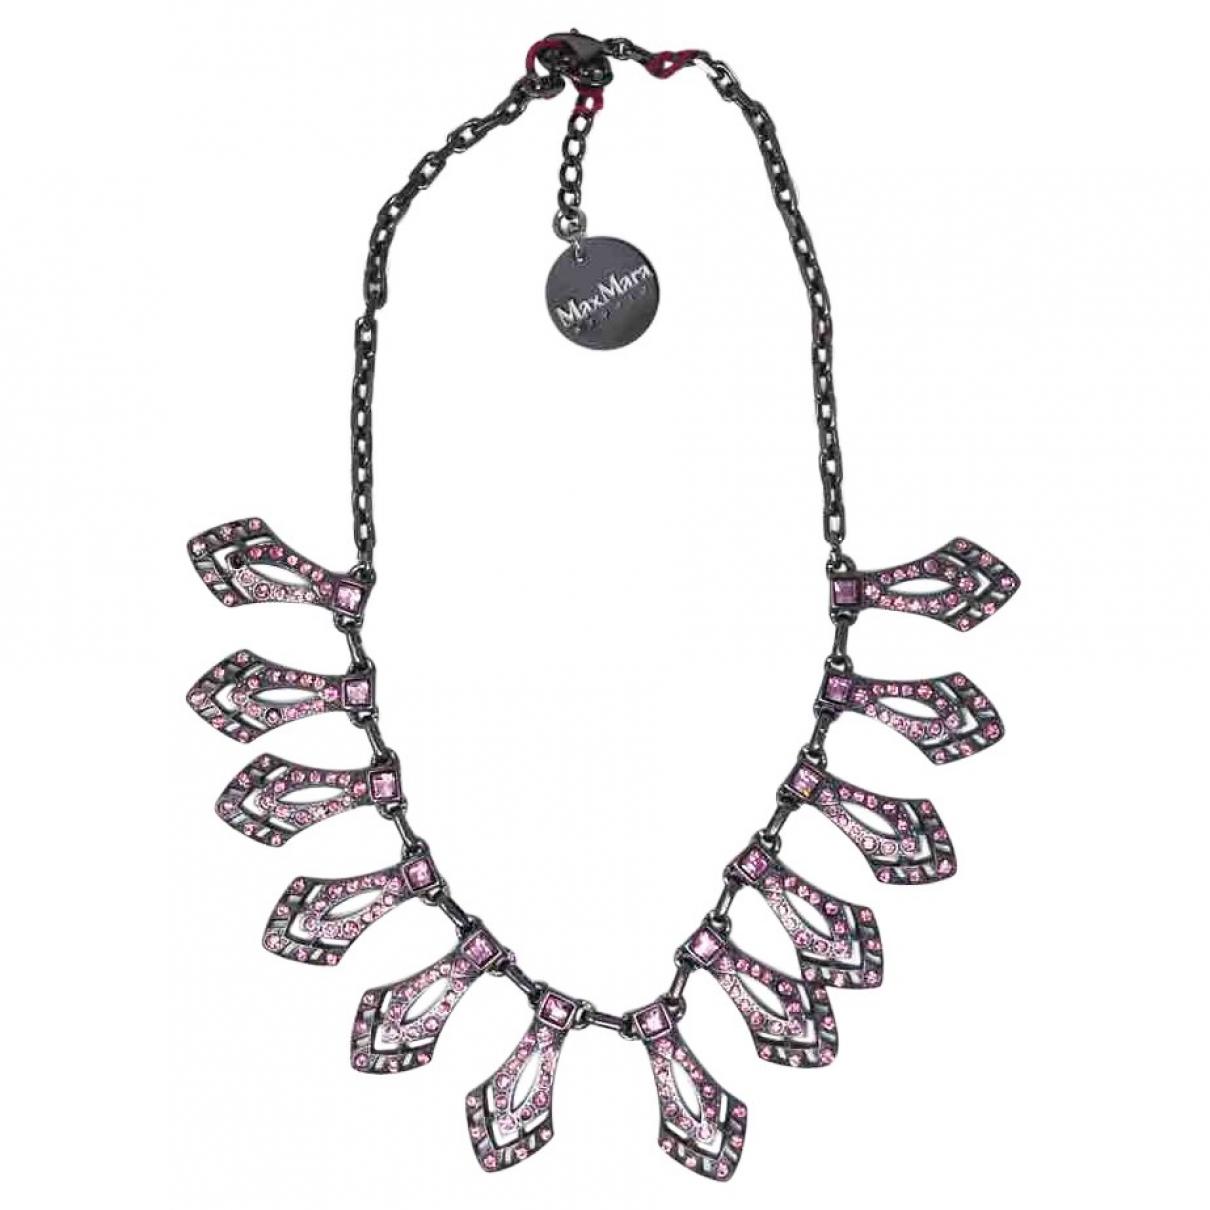 Max Mara Studio \N Black Metal necklace for Women \N